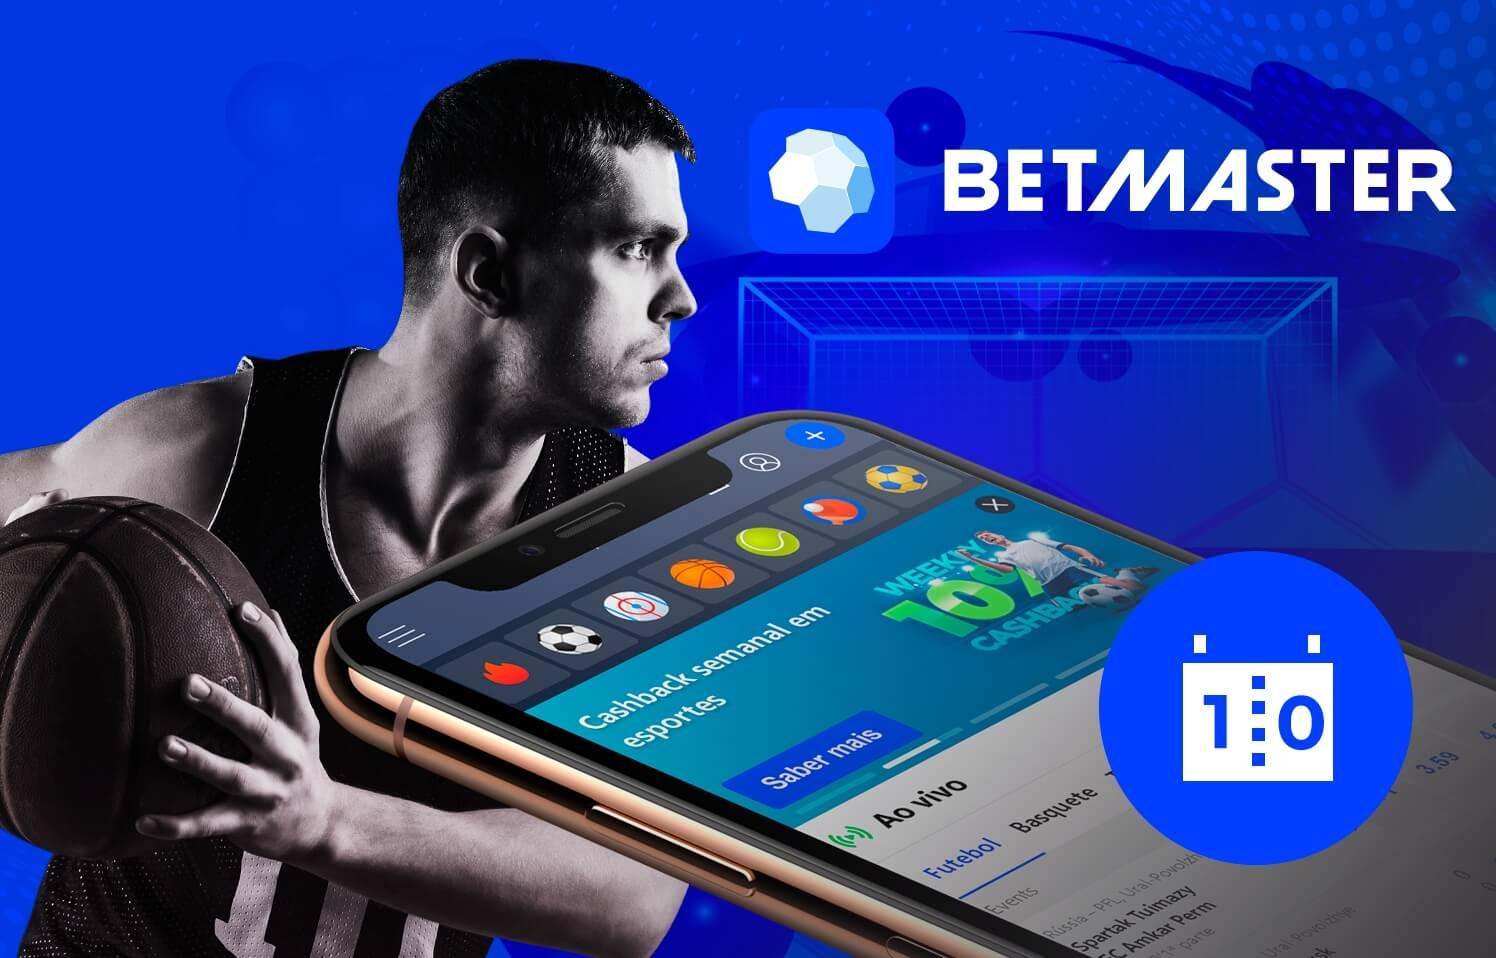 Betmaster smartphone jogador